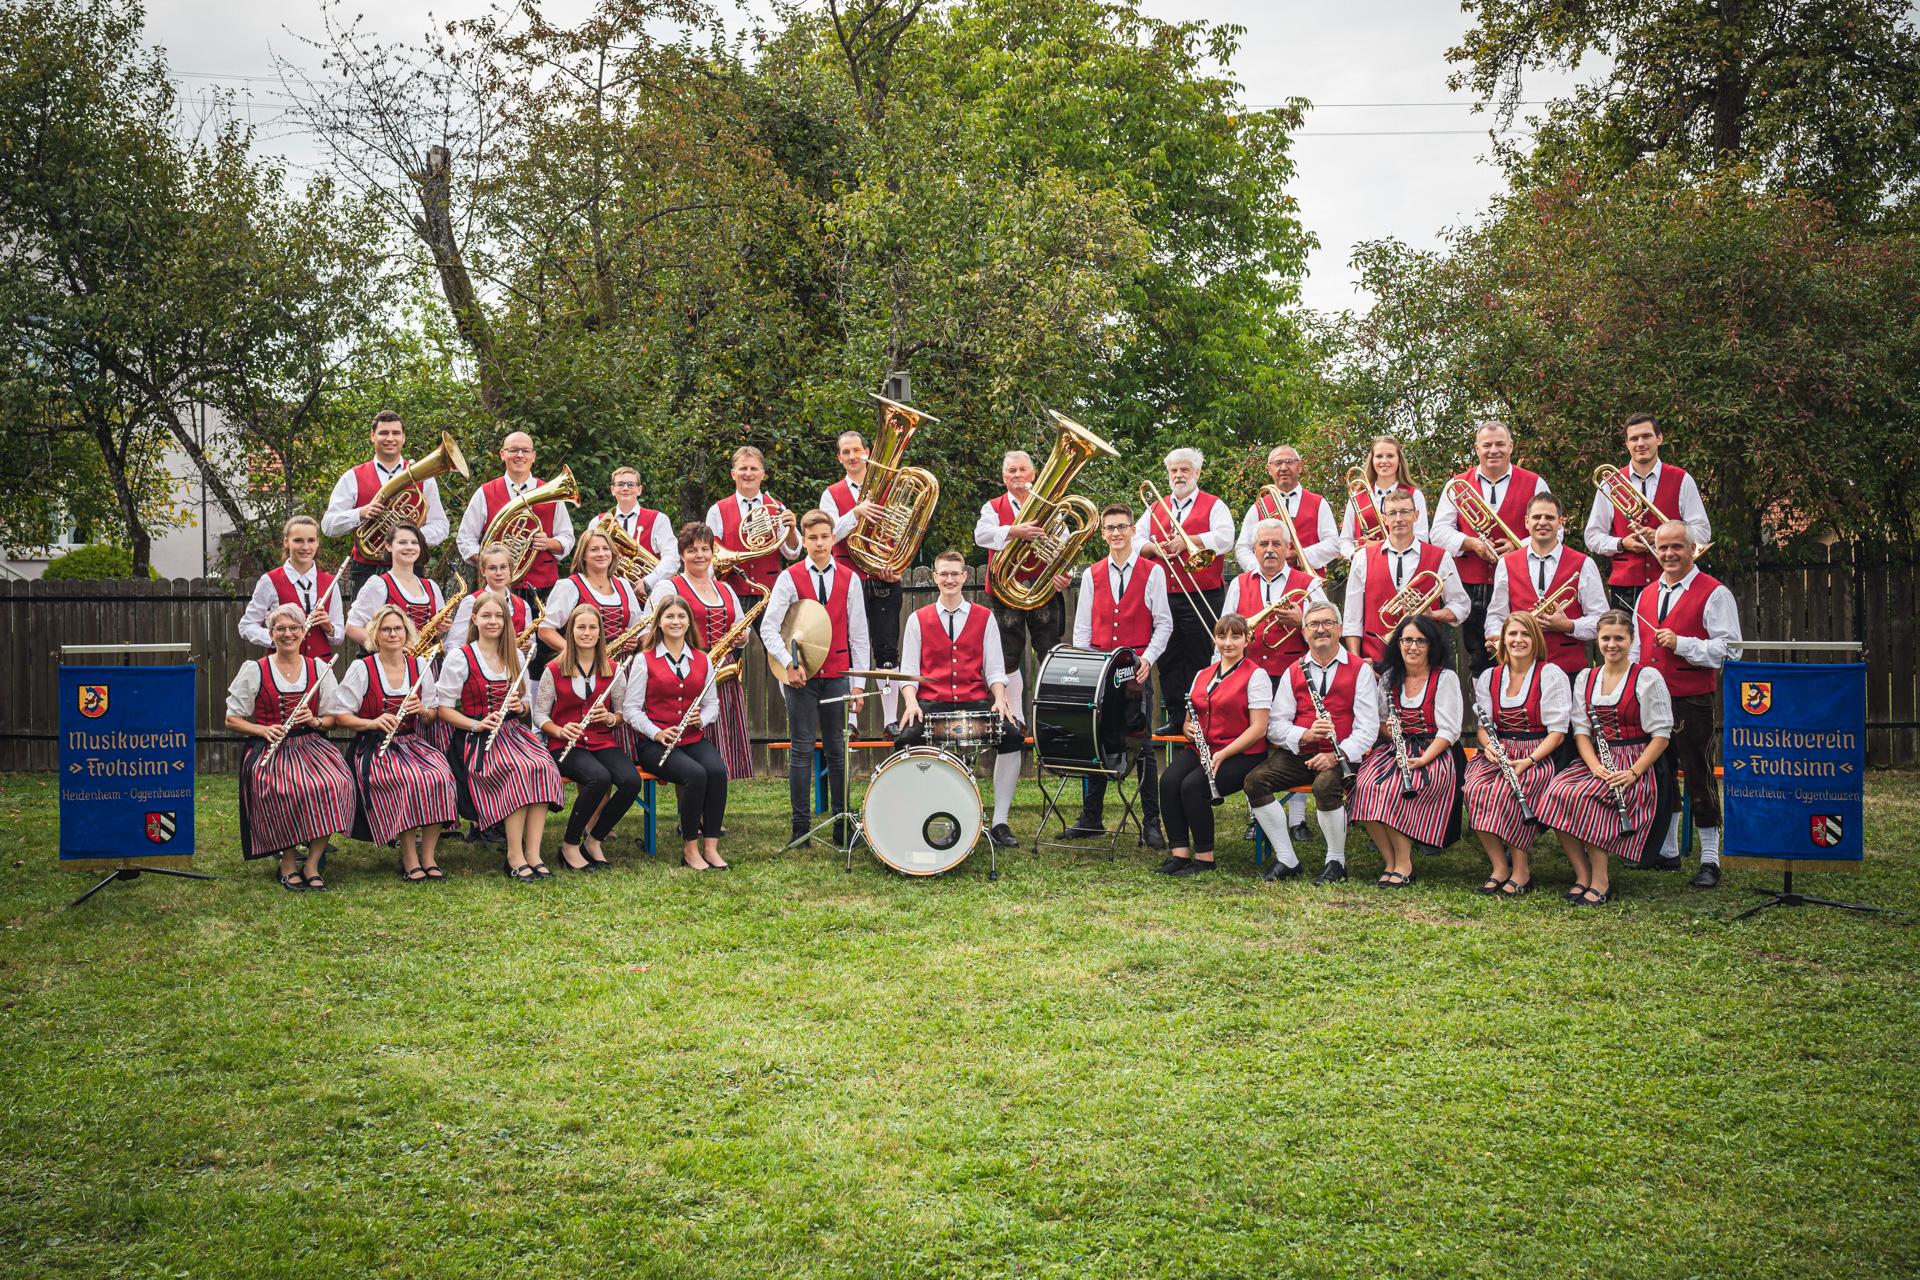 Musikverein Oggenhausen 2019